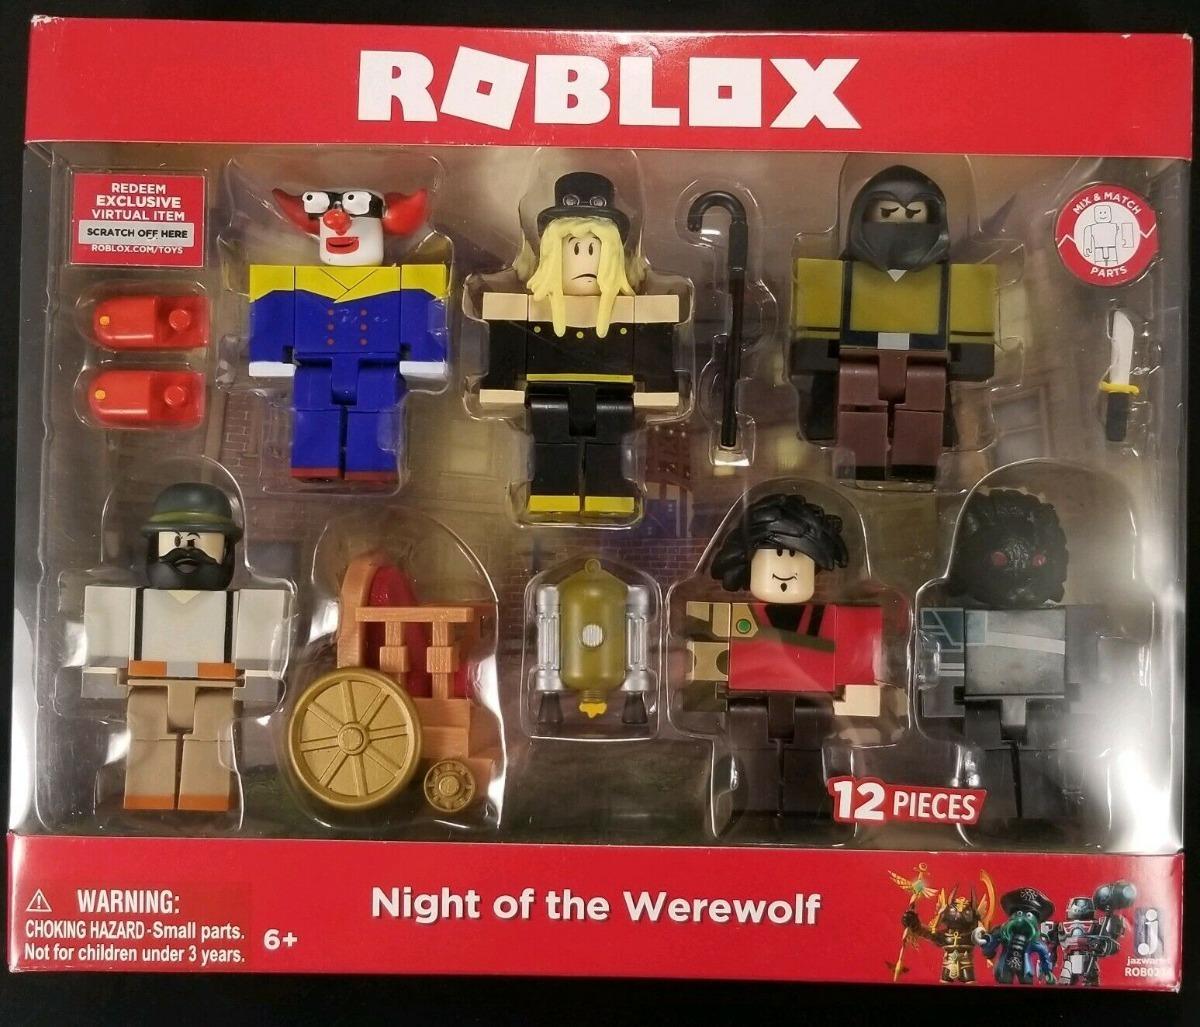 Roblox Night Of The Werewolf Six Figure Pack - roblox night of the werewolf pack